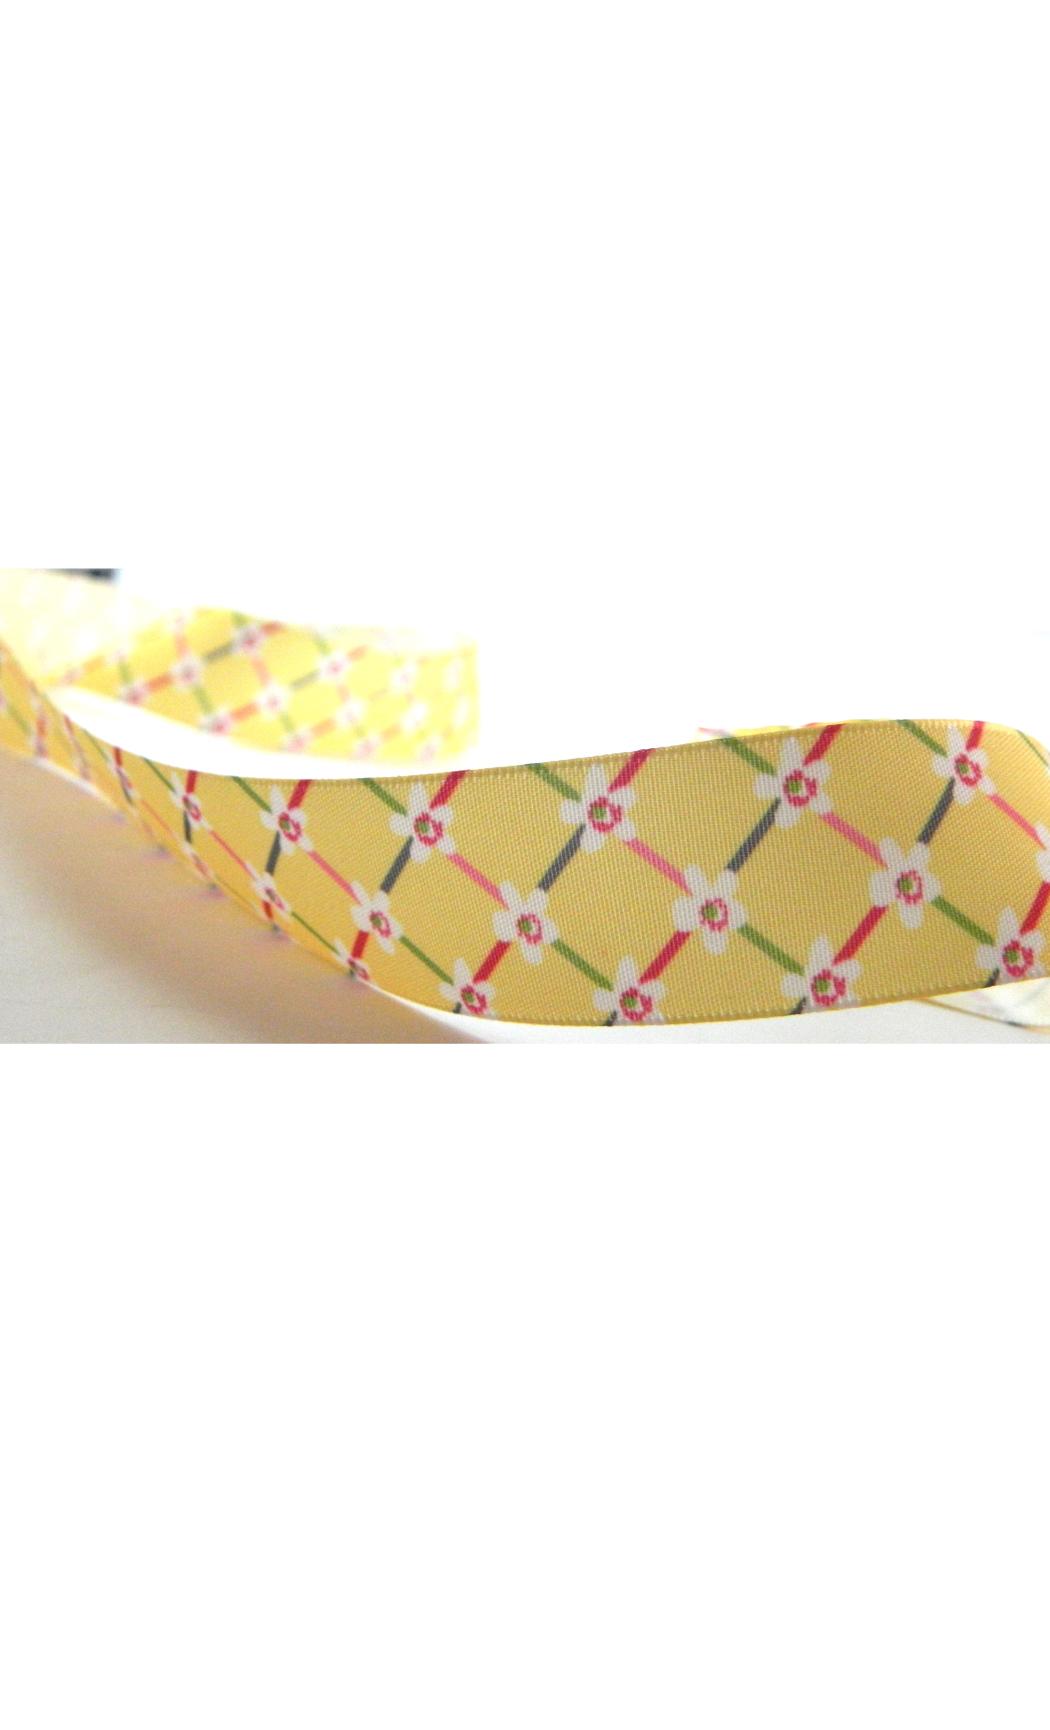 Yellow Satin Floral Printed Ribbon - Buy Online